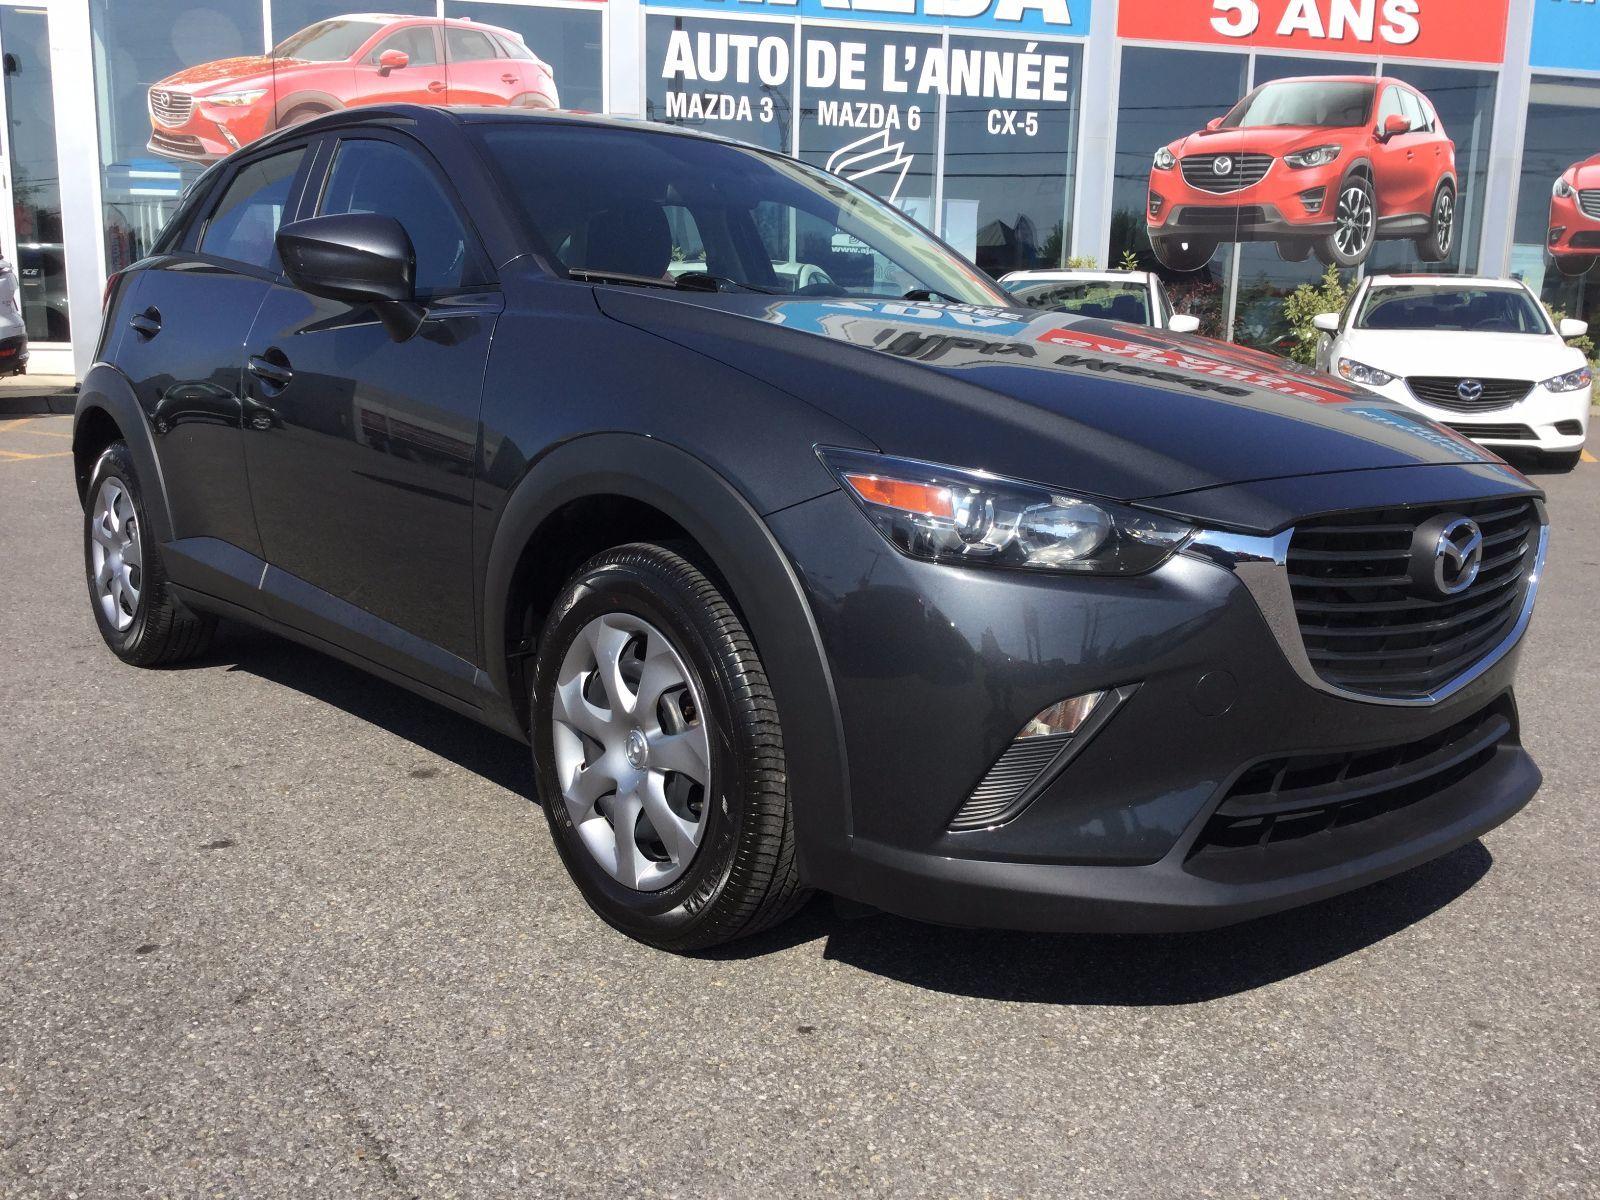 Mazda CX-3 GX,AWD,UN SEUL PROPRIÉTAIRE,GARANTIE JUSQU EN 2020 2016 CAMÉRA DE RECUL, BLUETOOTH,